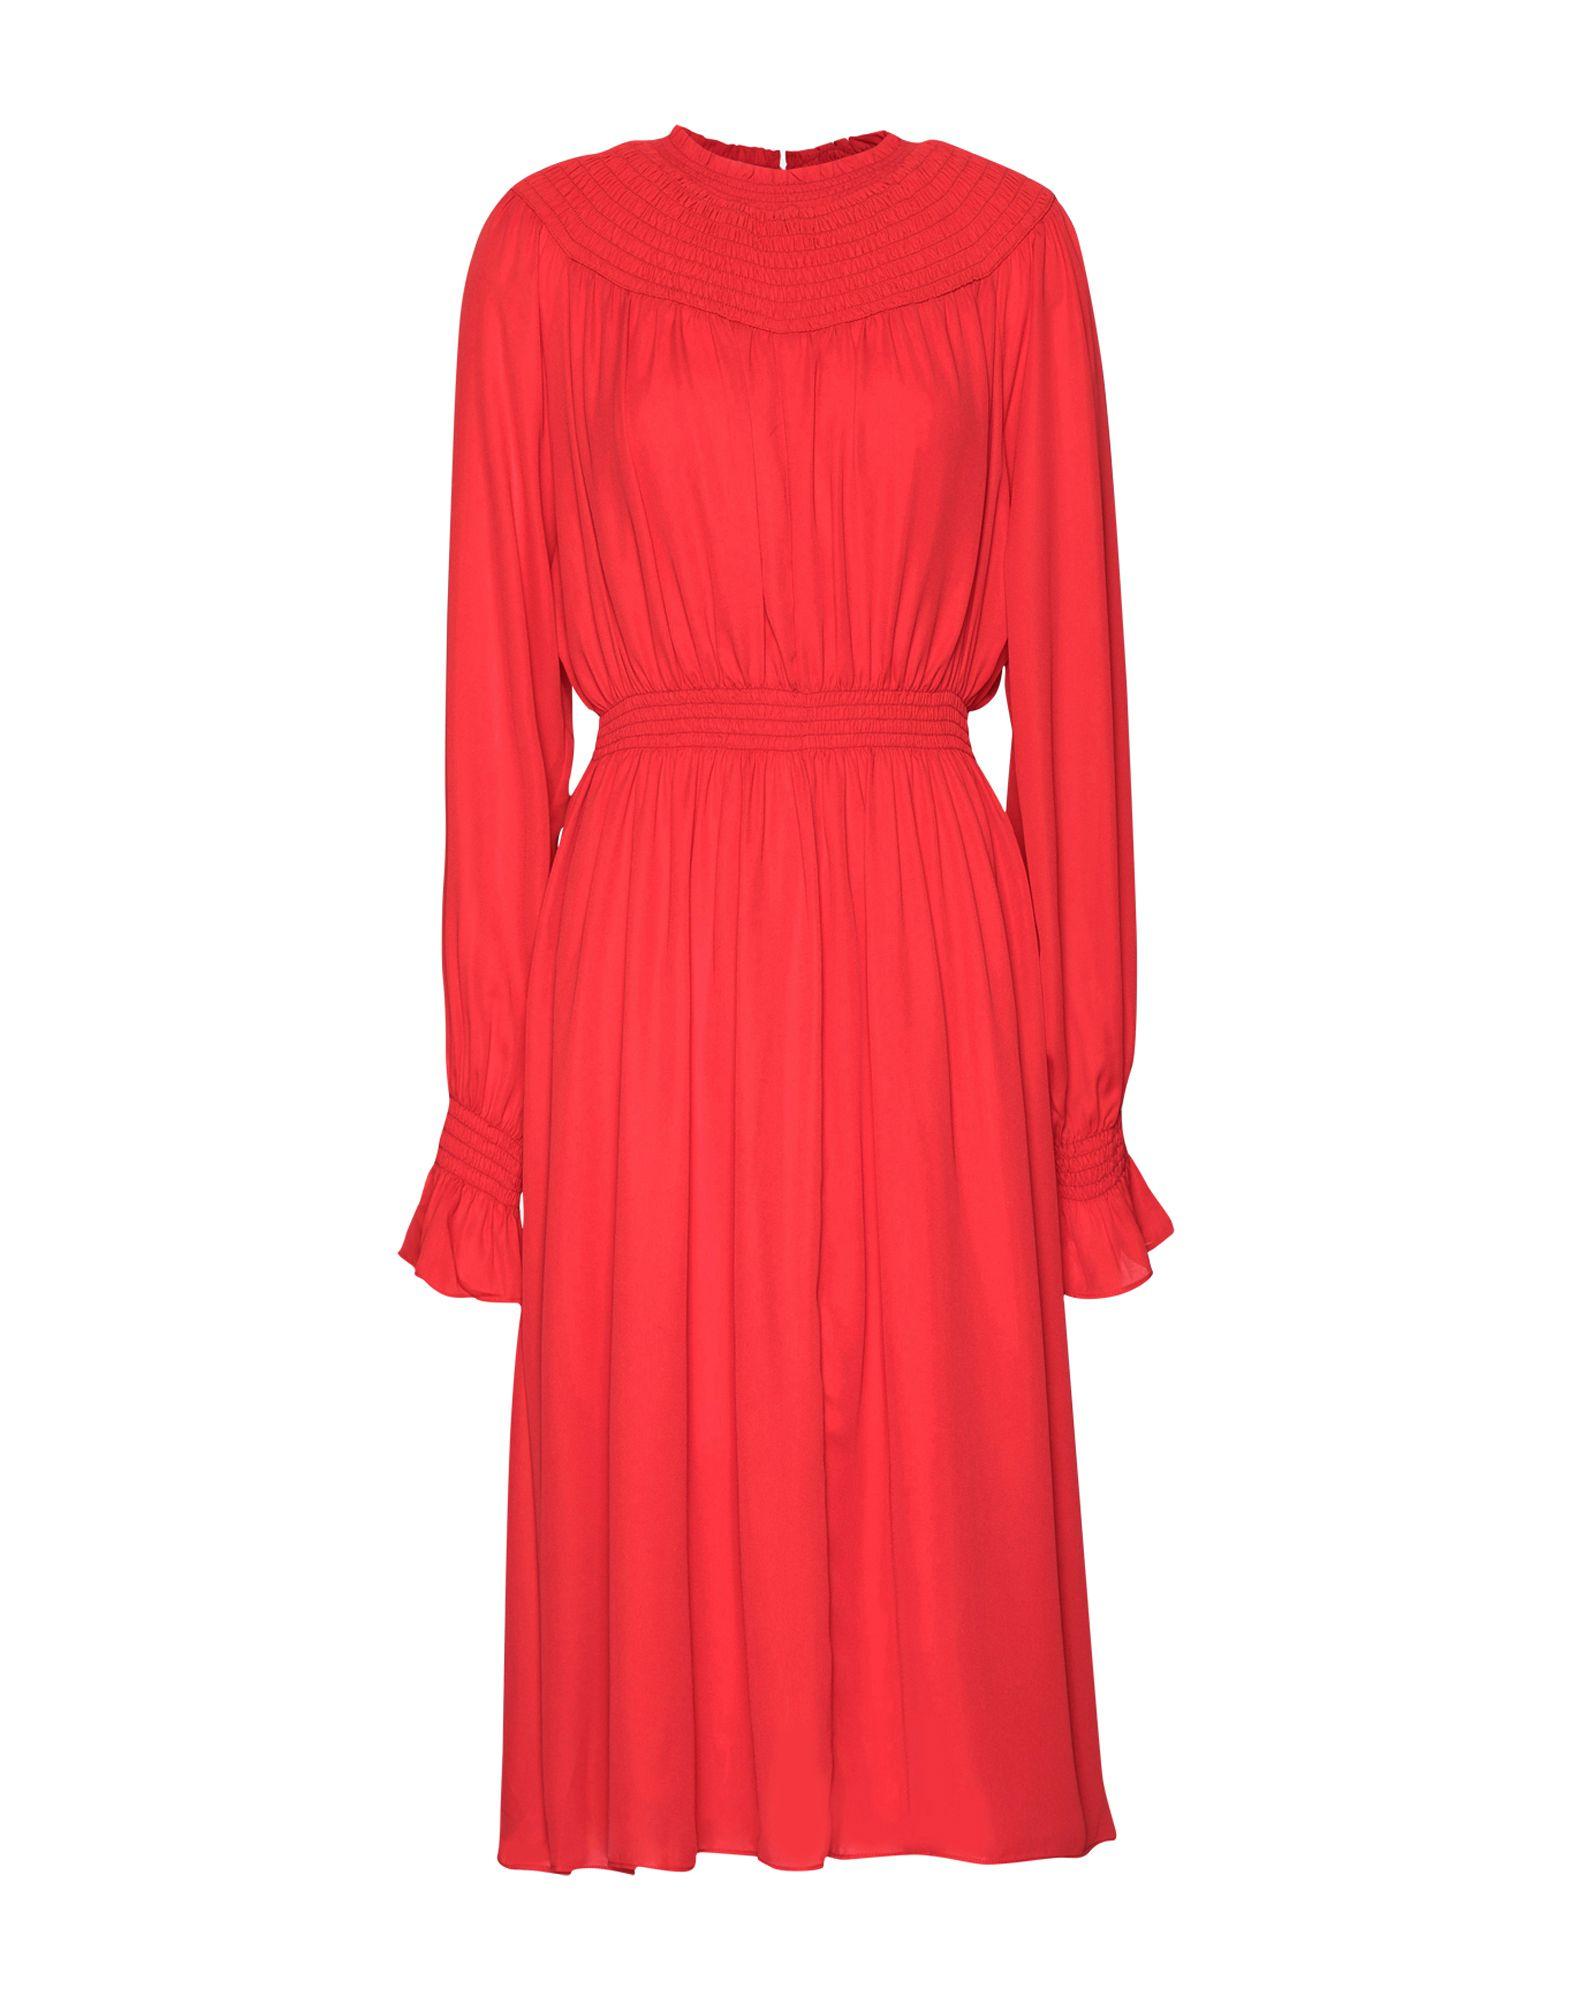 GEORGE J. LOVE Платье длиной 3/4 платье для девочек jilly 2015 colthes baby j 184568 page 4